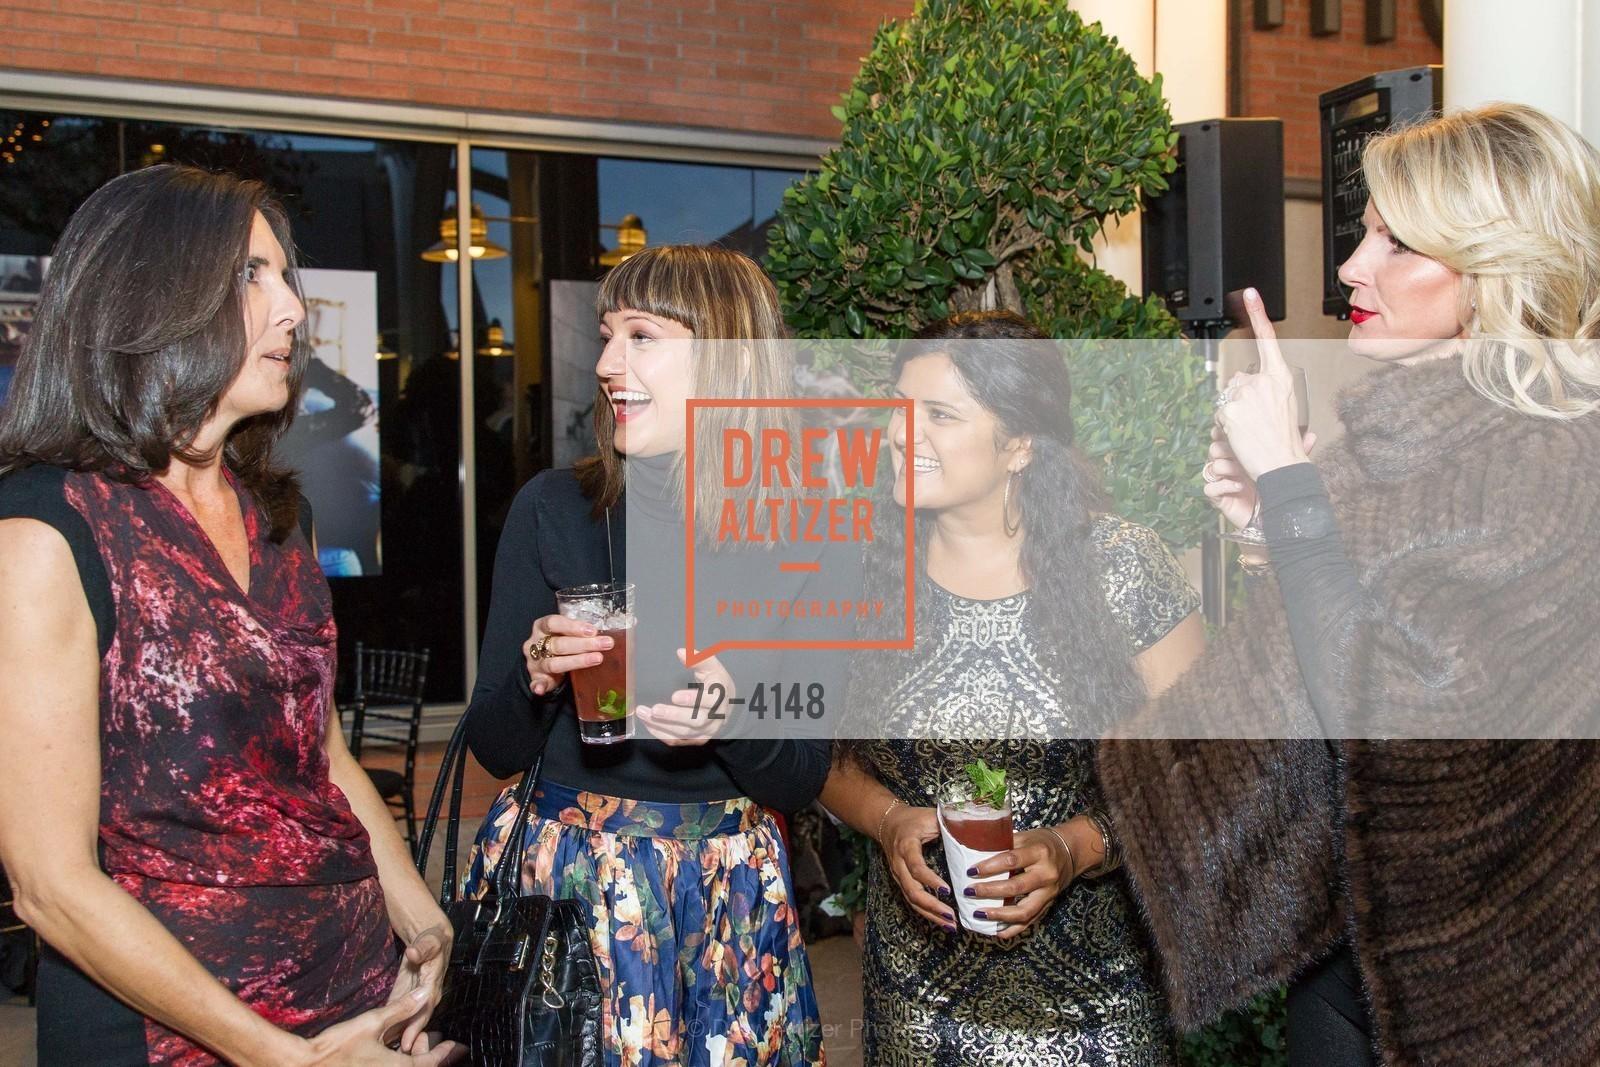 Michele Sharkey, Monique Lombardelli, Avani Patel, Sam Bowman, Photo #72-4148